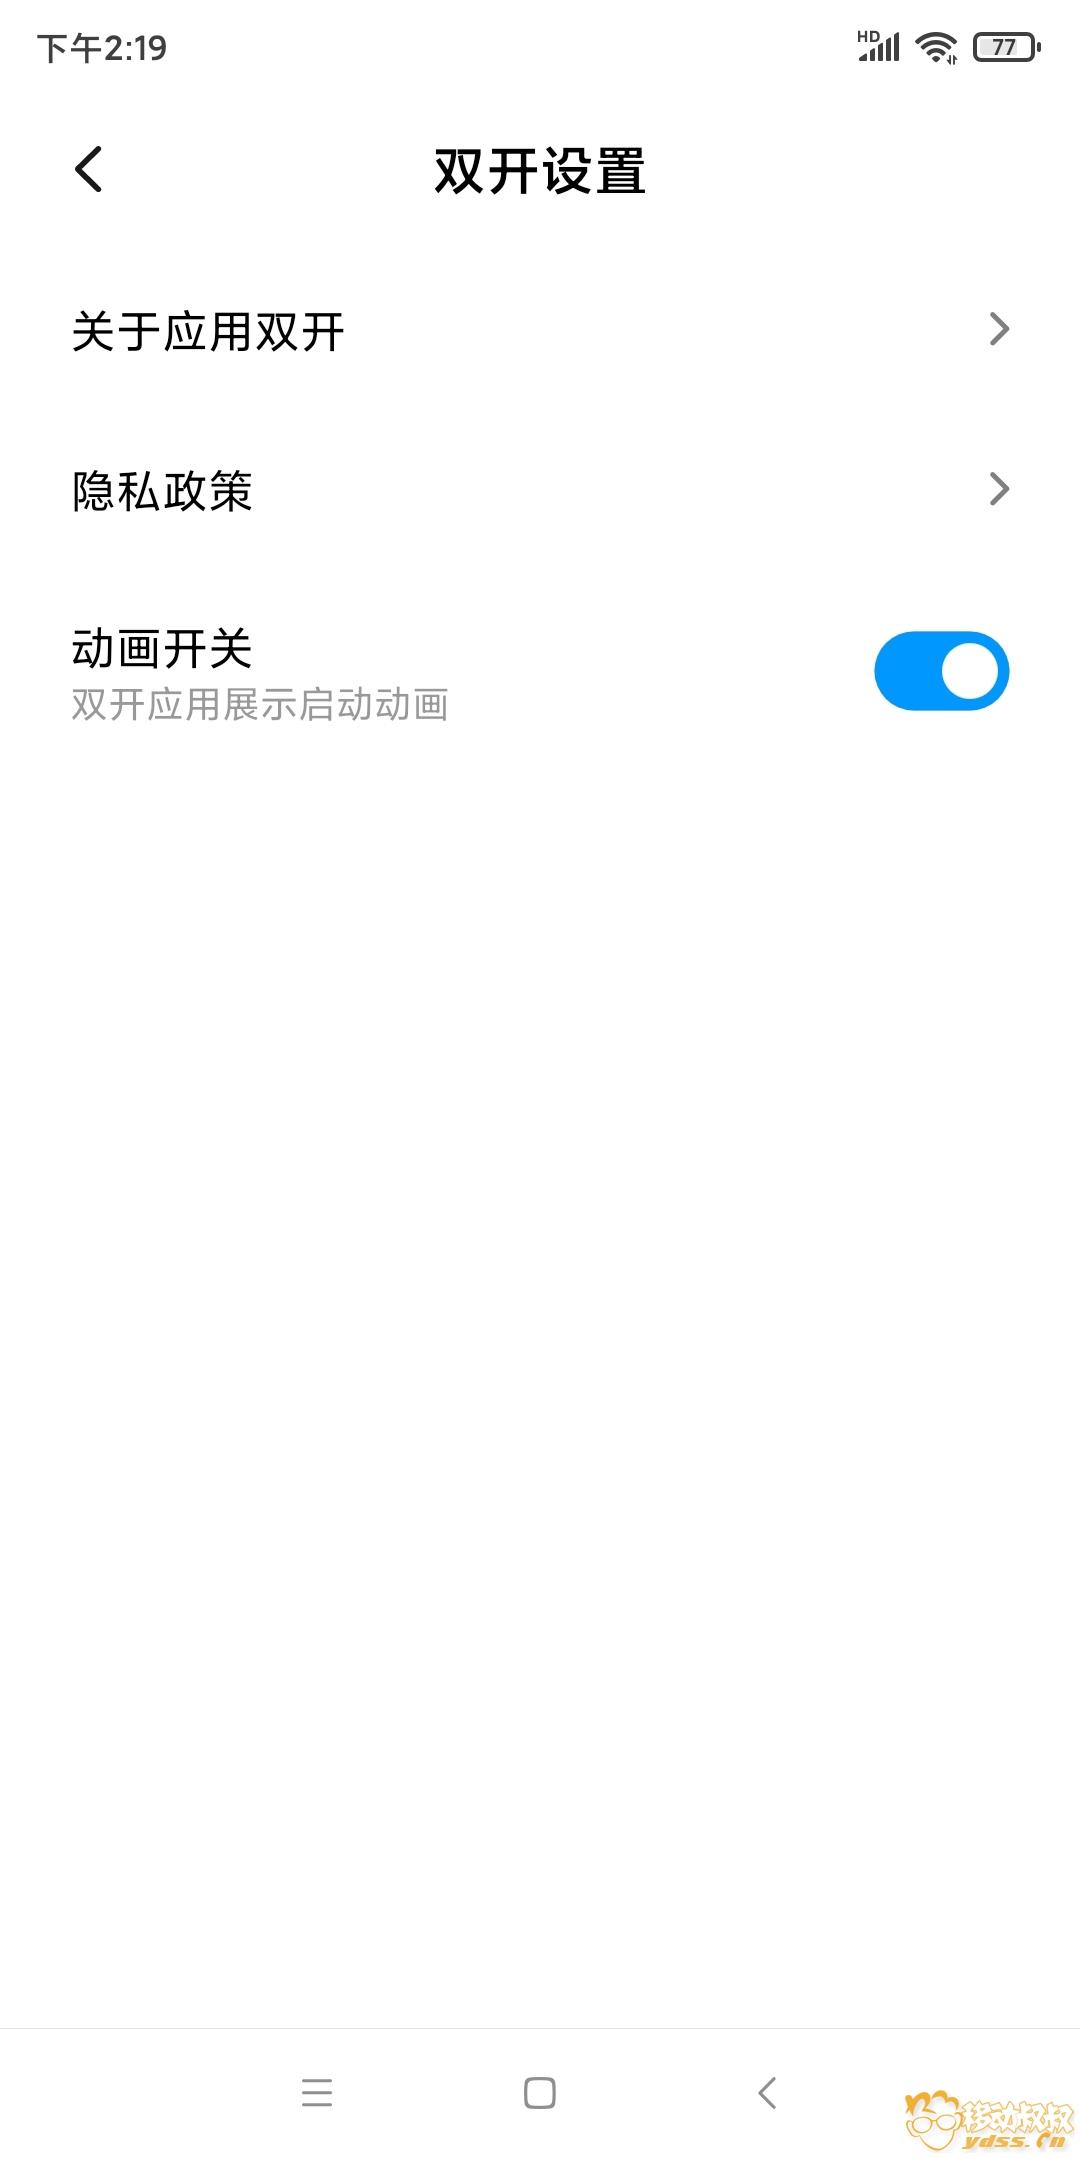 Screenshot_2019-11-13-14-19-44-568_com.miui.securitycore.jpg